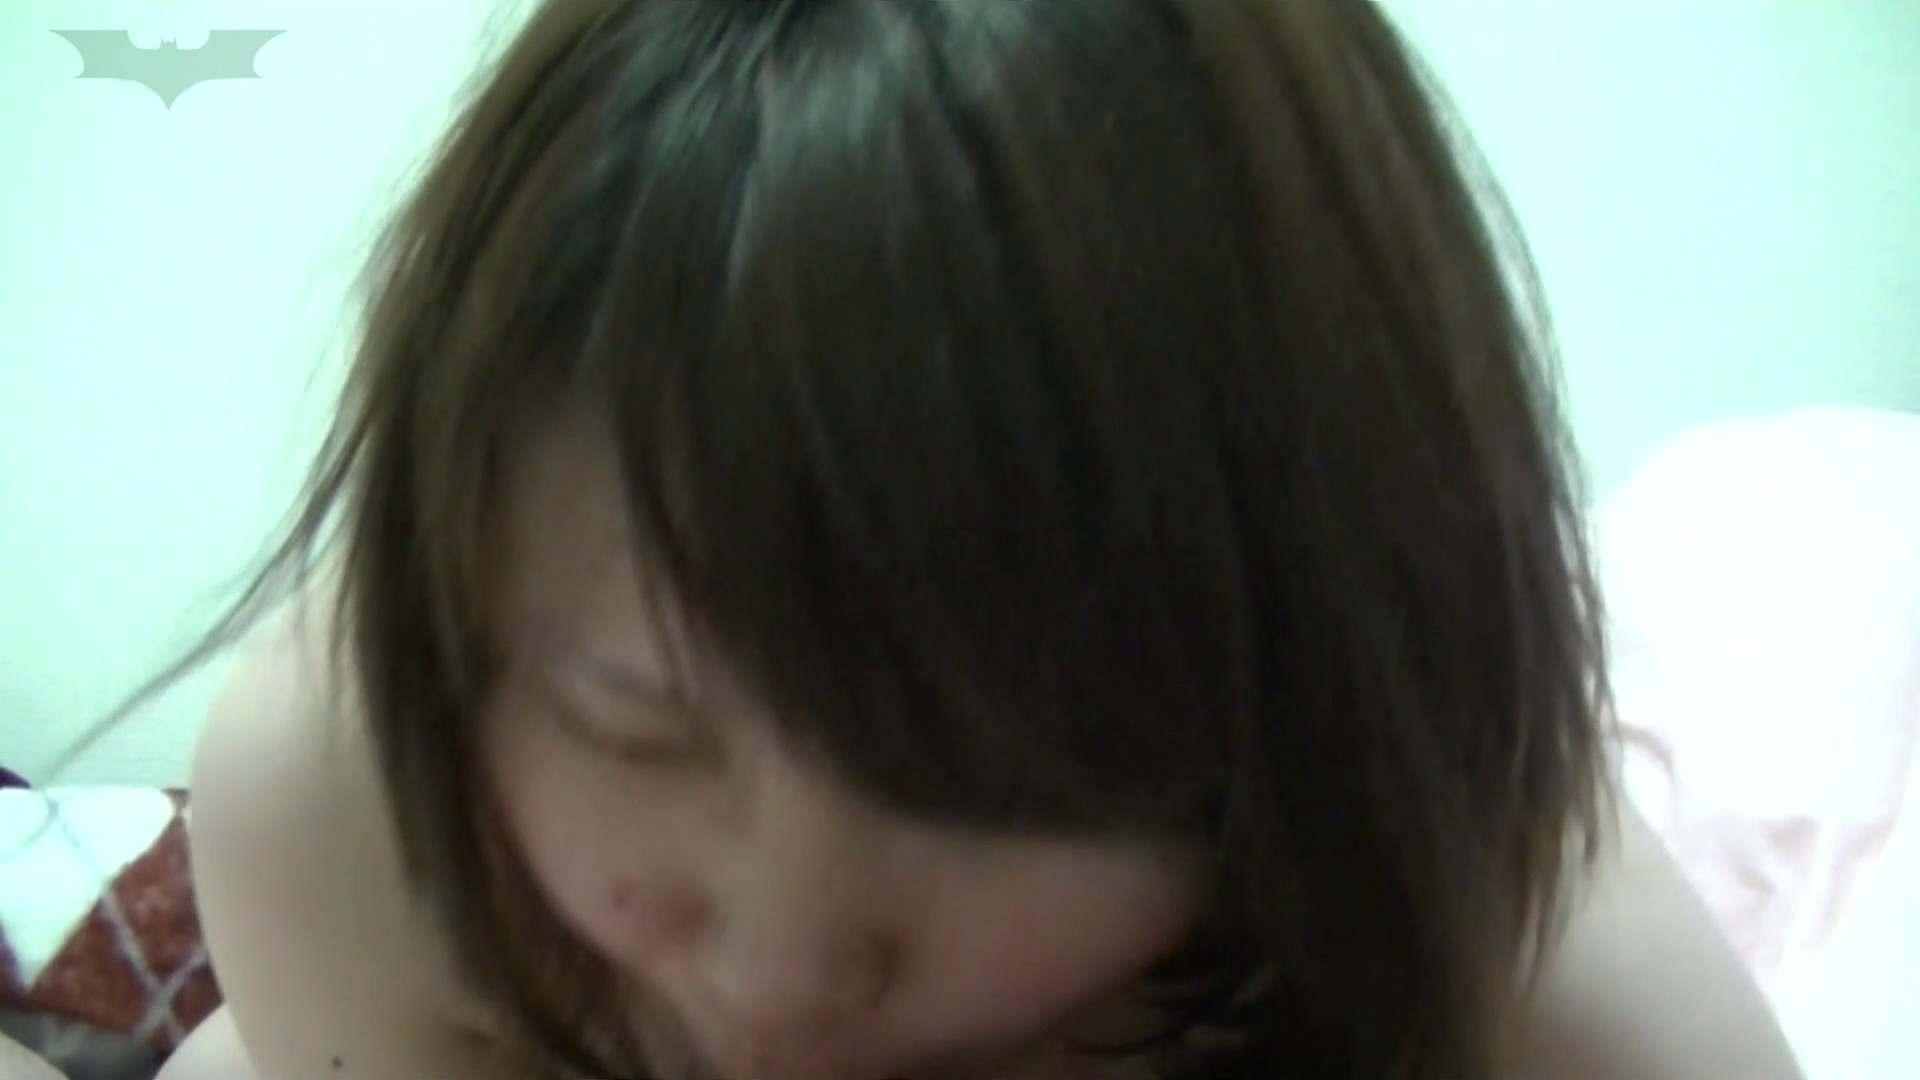 闇の花道Vol.08 影対姪っ子絶対ダメな調教関係Vol.02 期間限定  93PIX 92